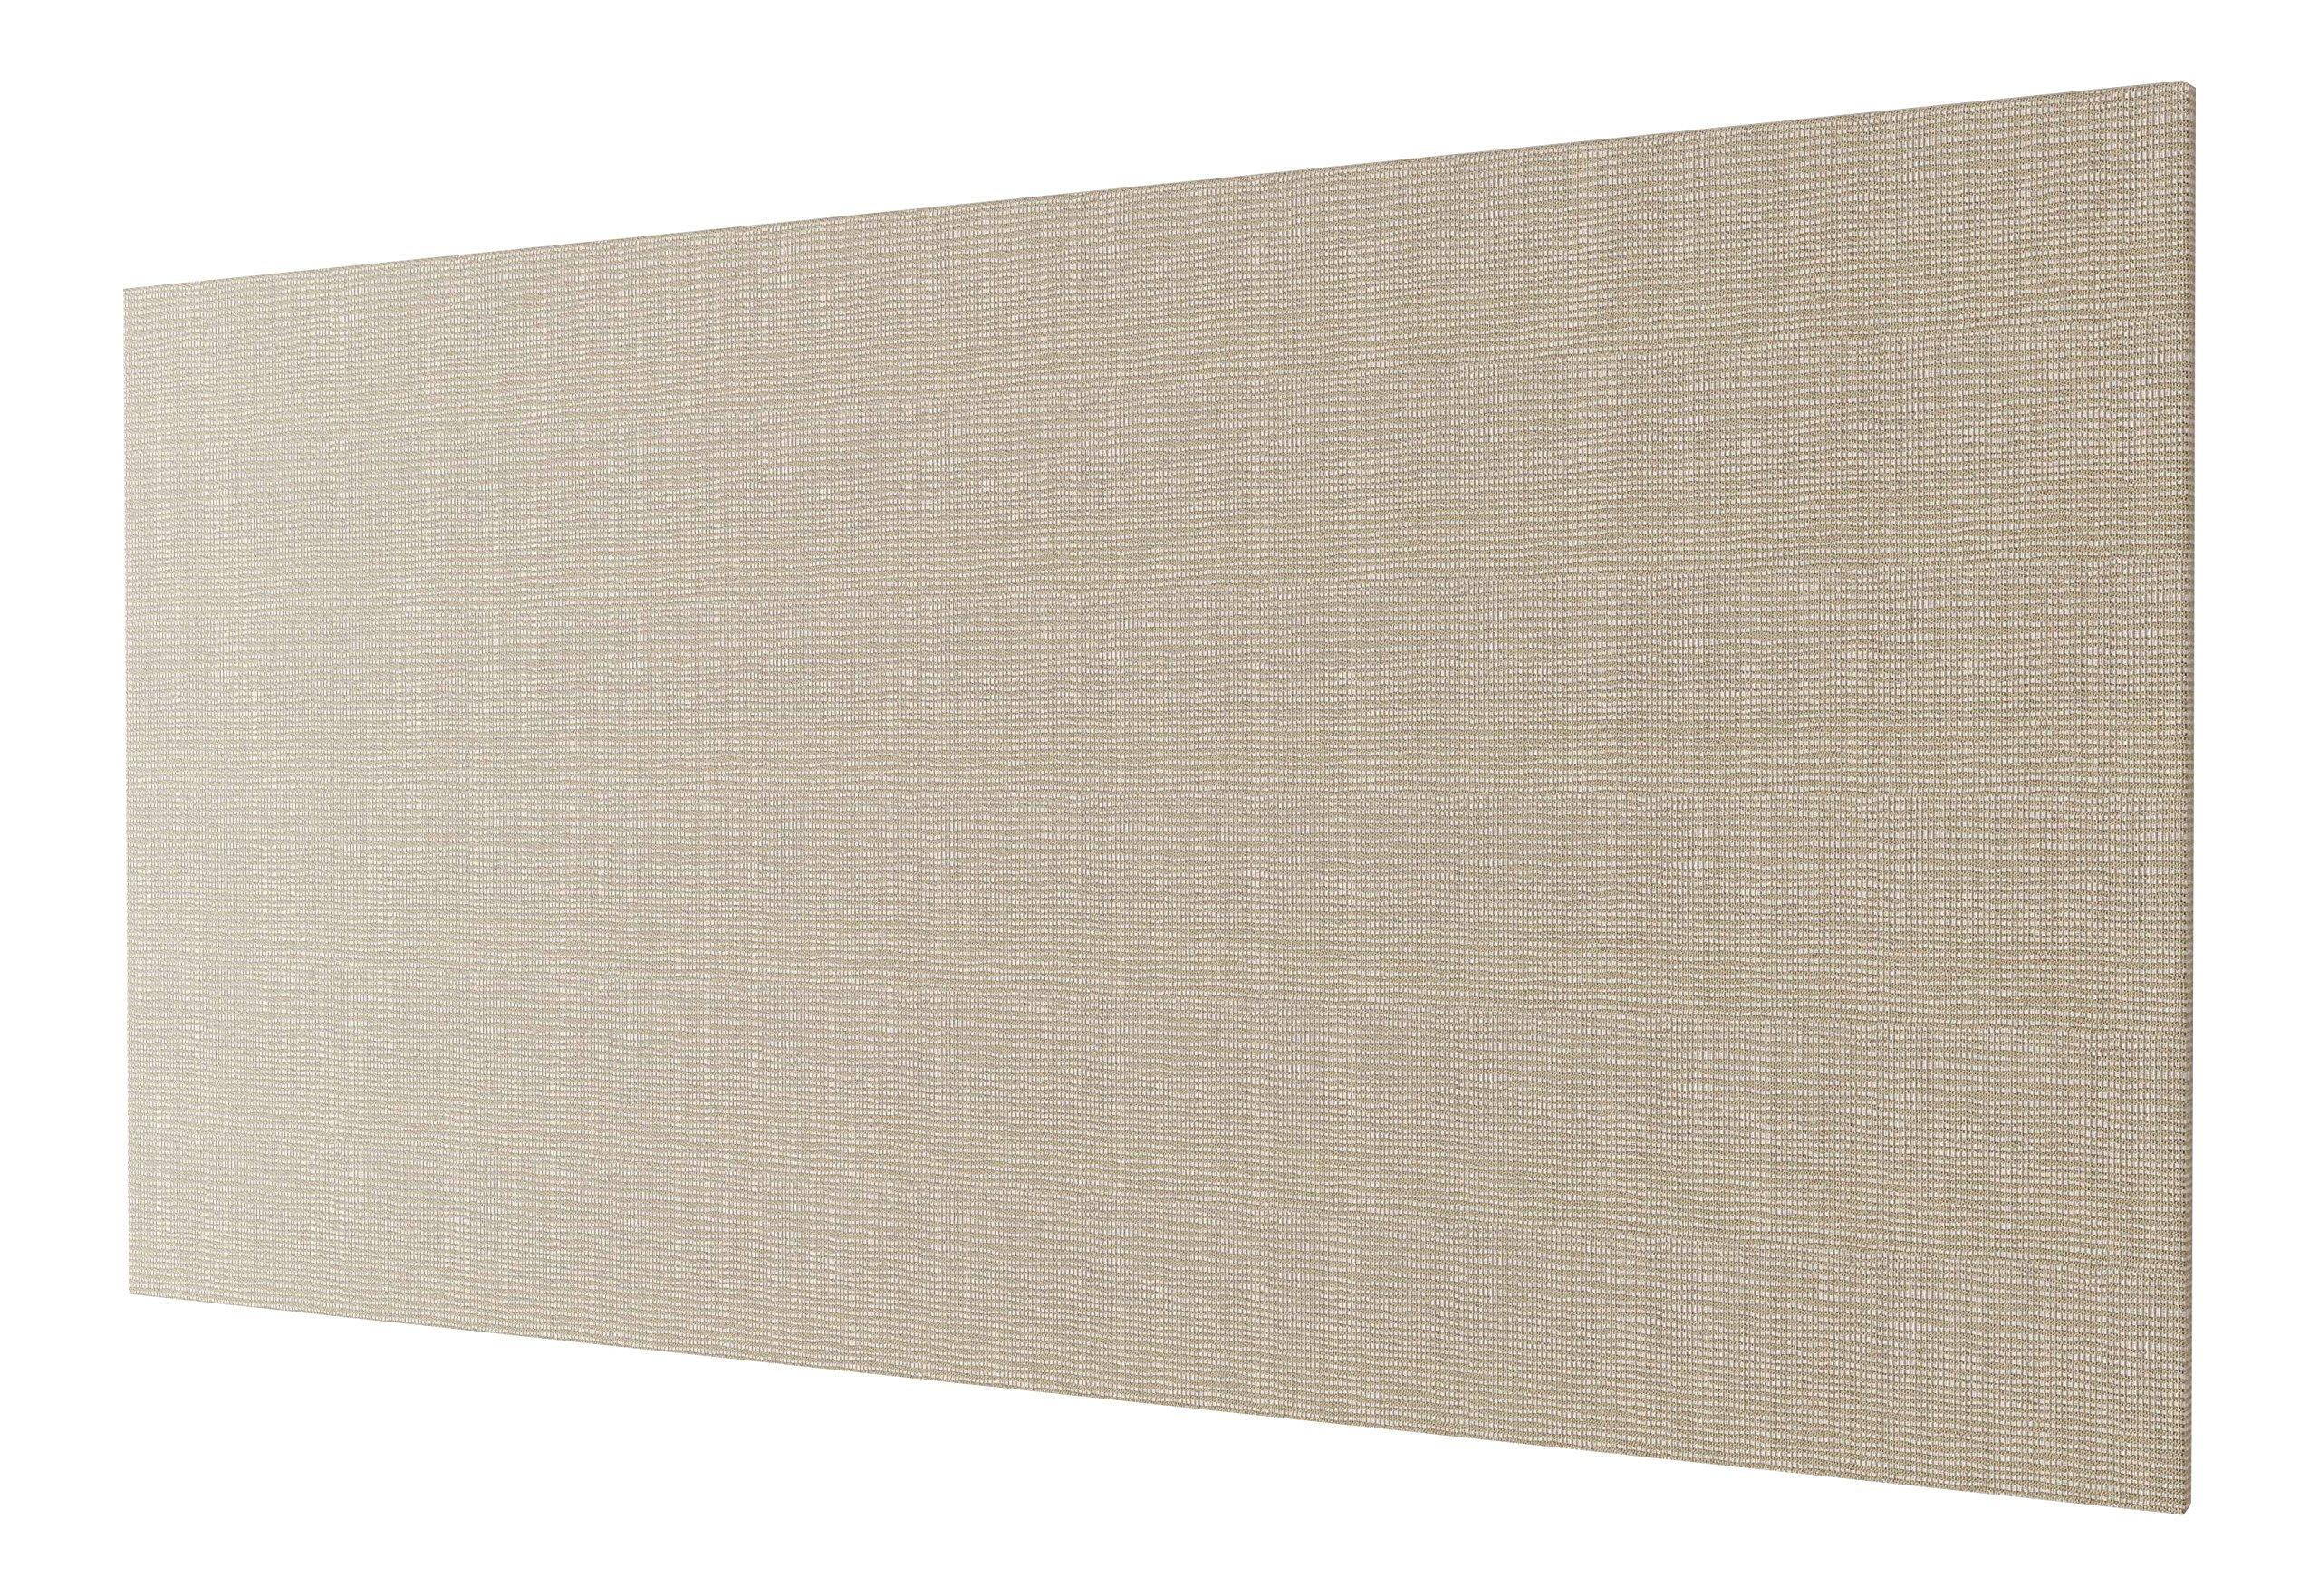 OBEX 30X60-TB-R-MO Rectangle Tackboard Contemporary Moss